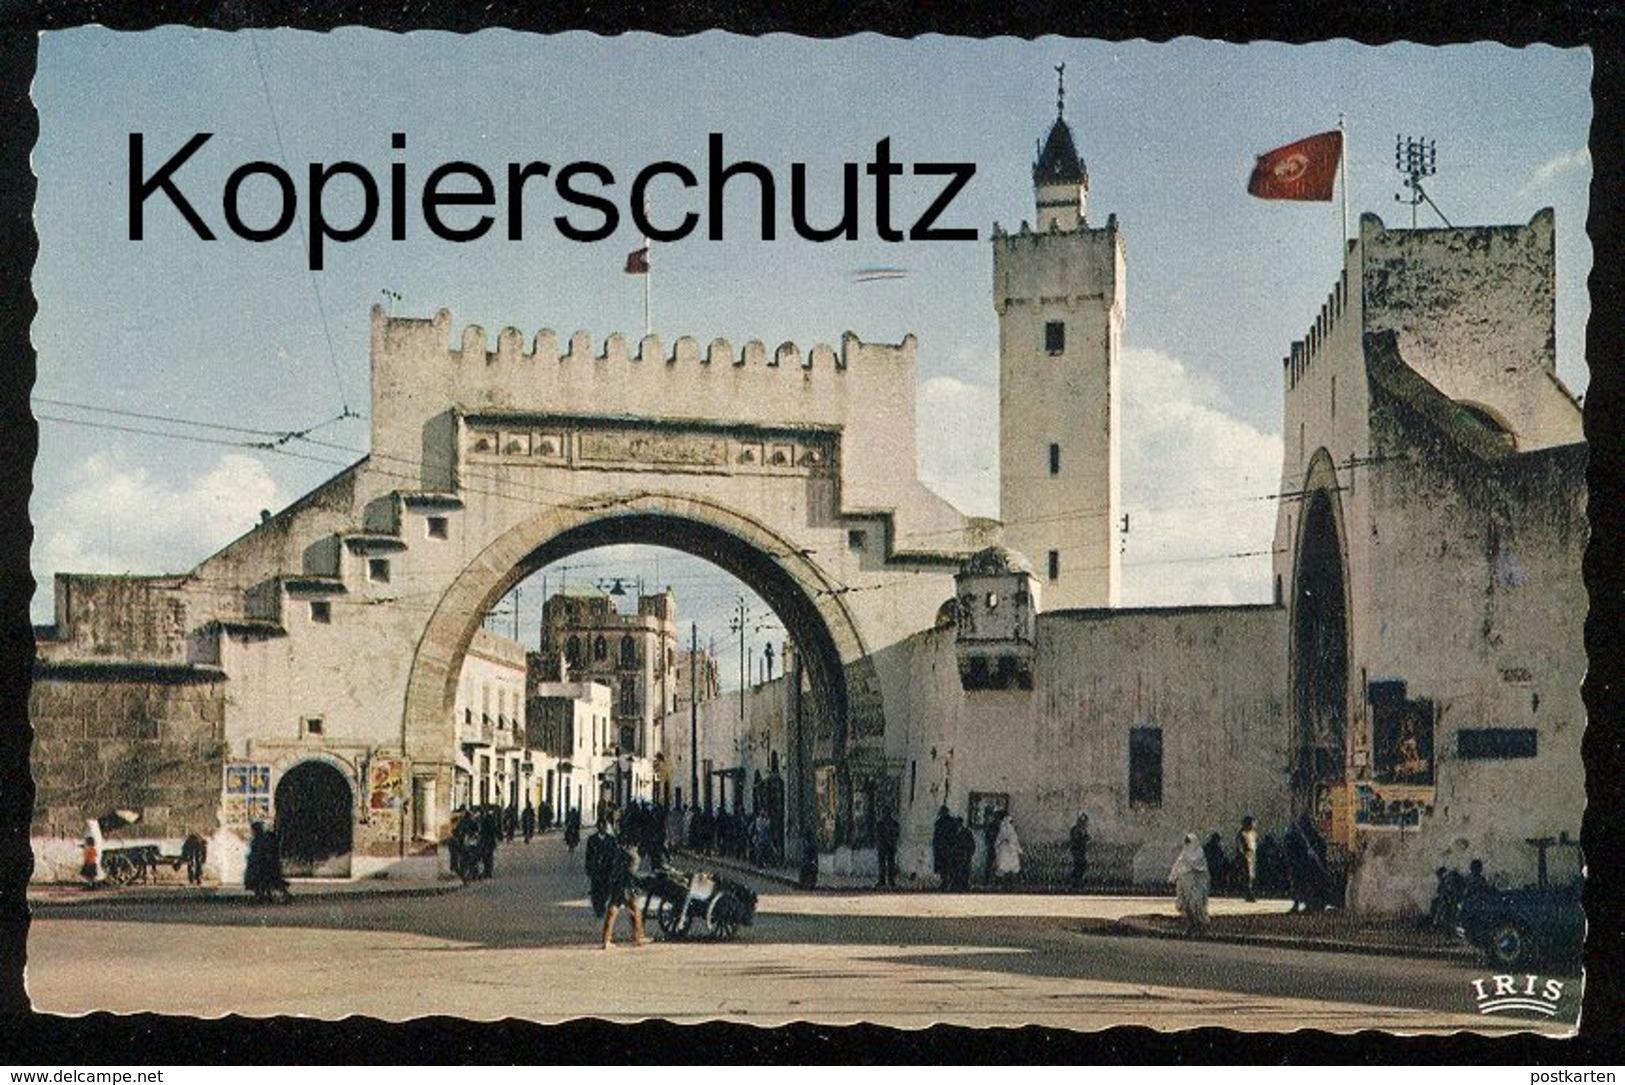 ÄLTERE POSTKARTE TUNIS BAB EL KHADRA TUNESIEN TUNISIA Tor gate porte postcard cpa Ansichtskarte AK IRIS Verlag Paris